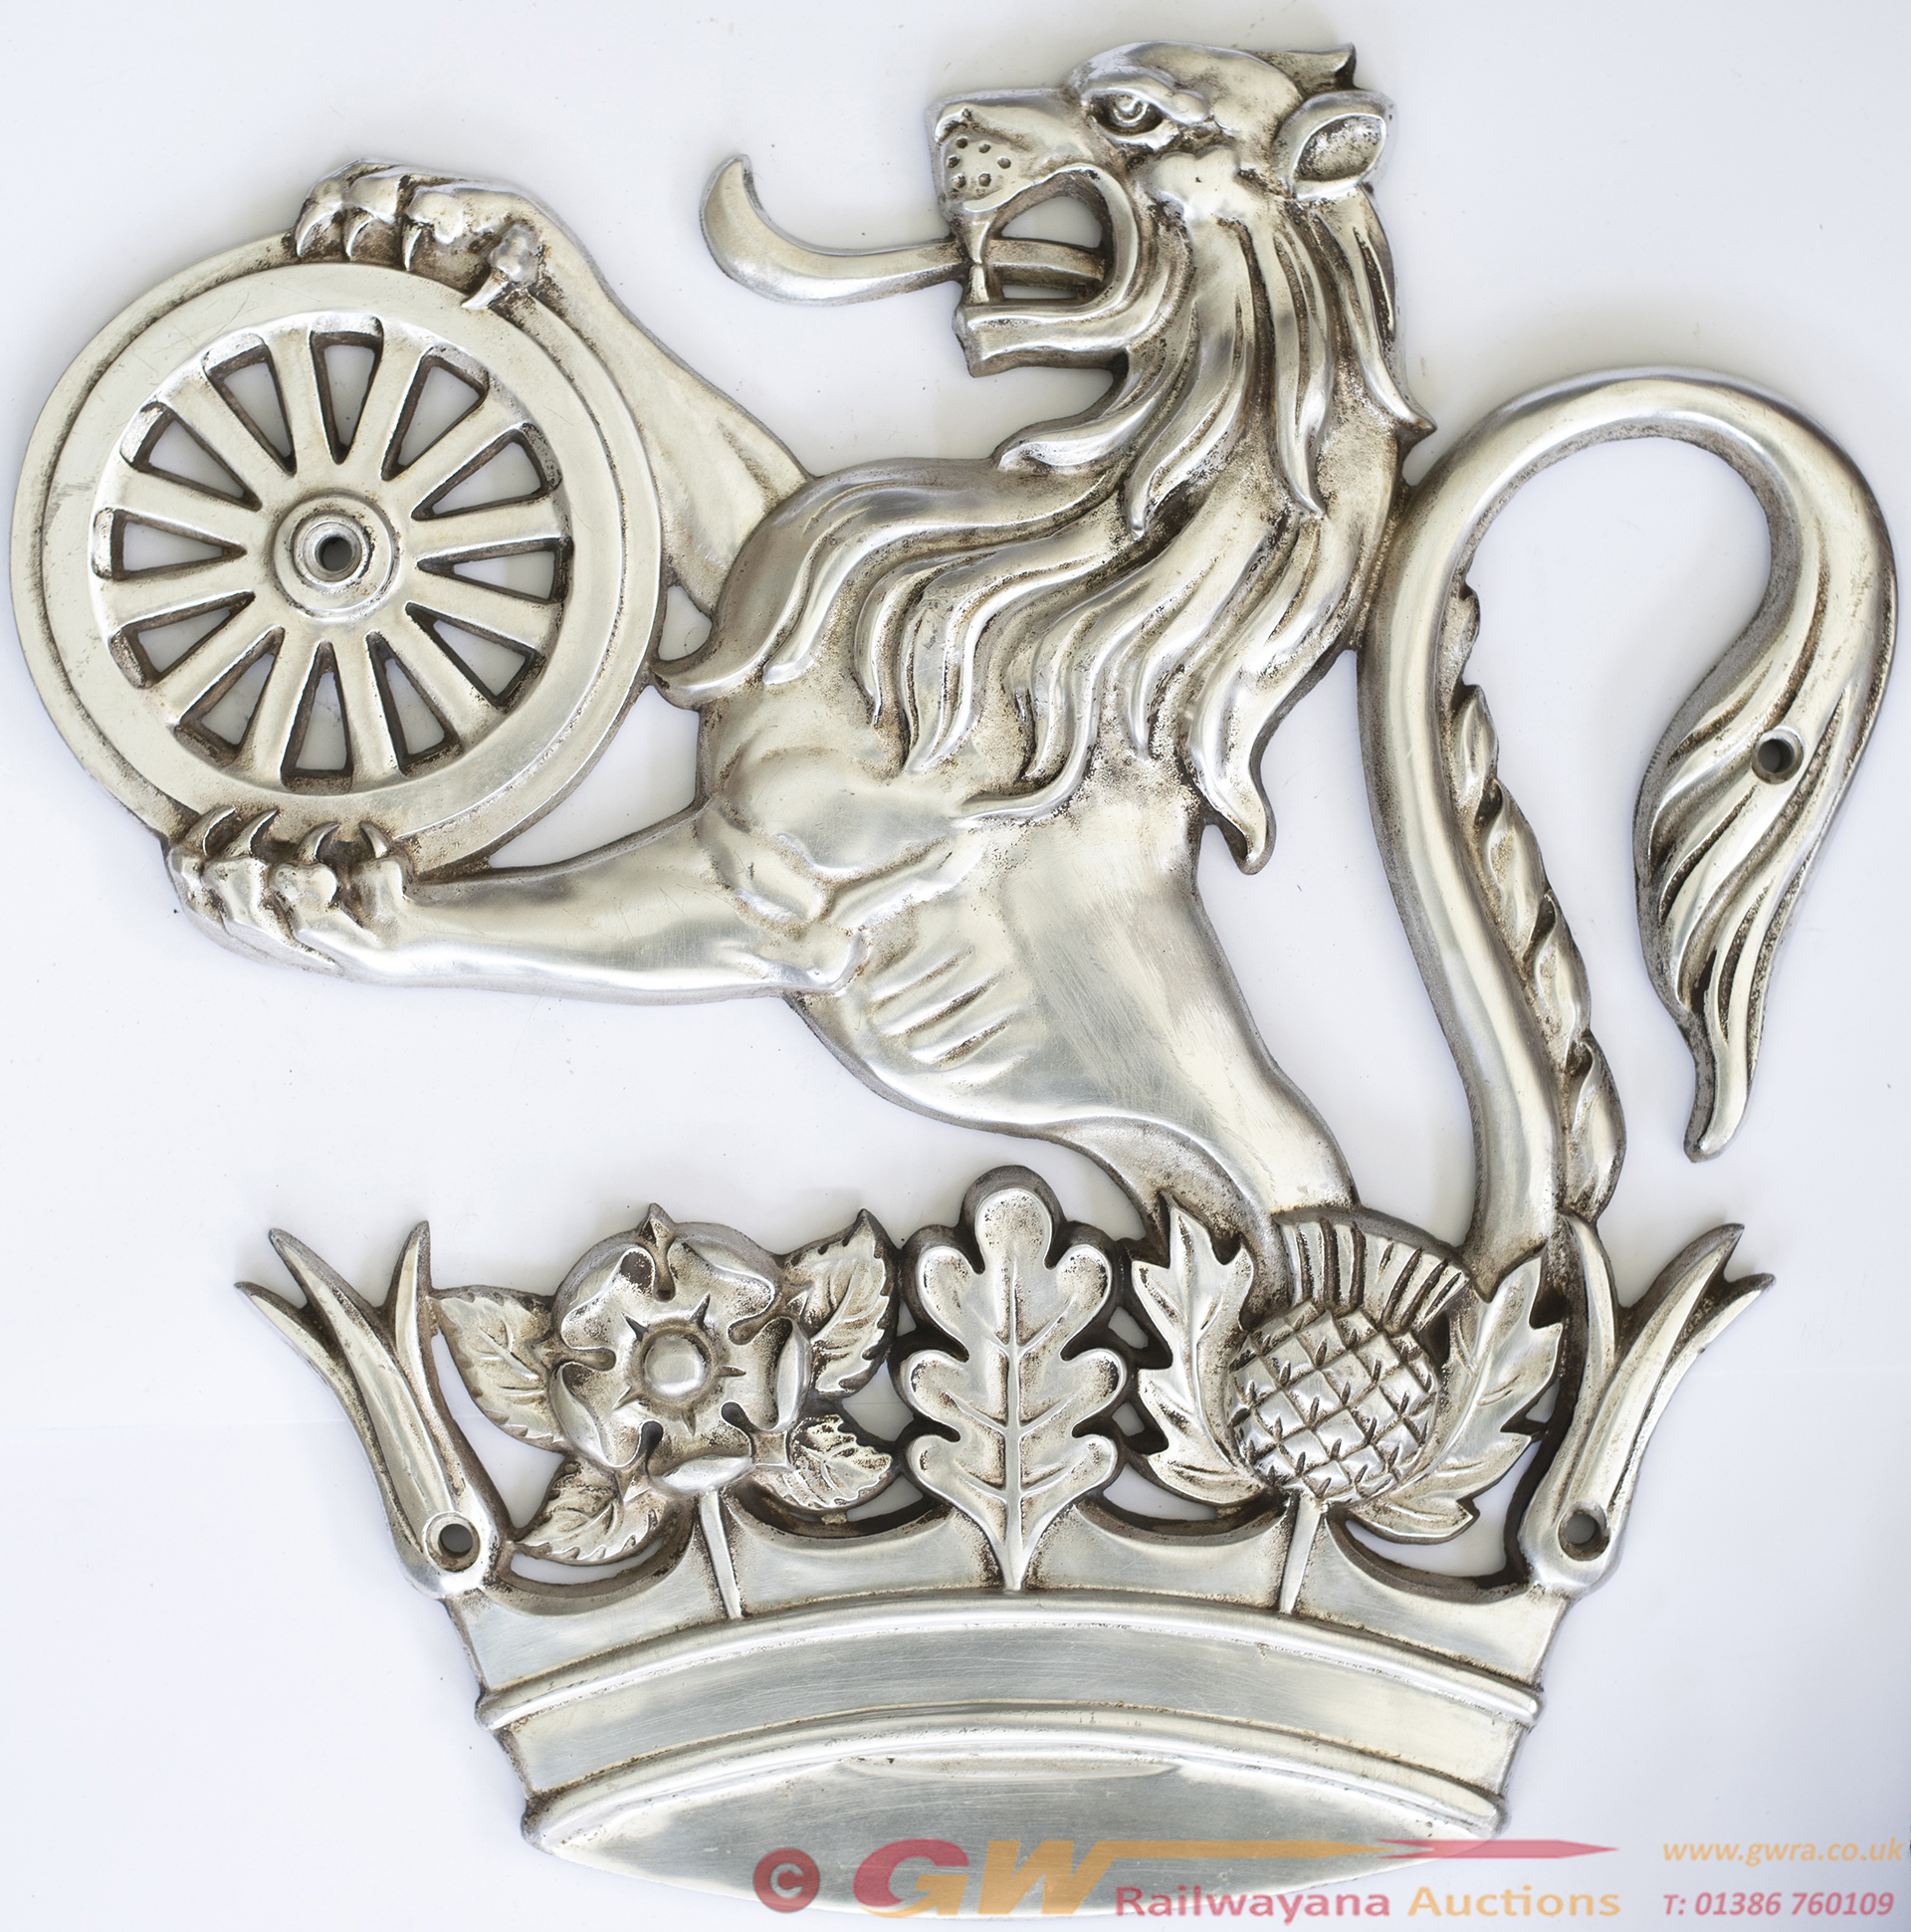 BR Lion Over Wheel Cast Aluminium Crest, Ex Class